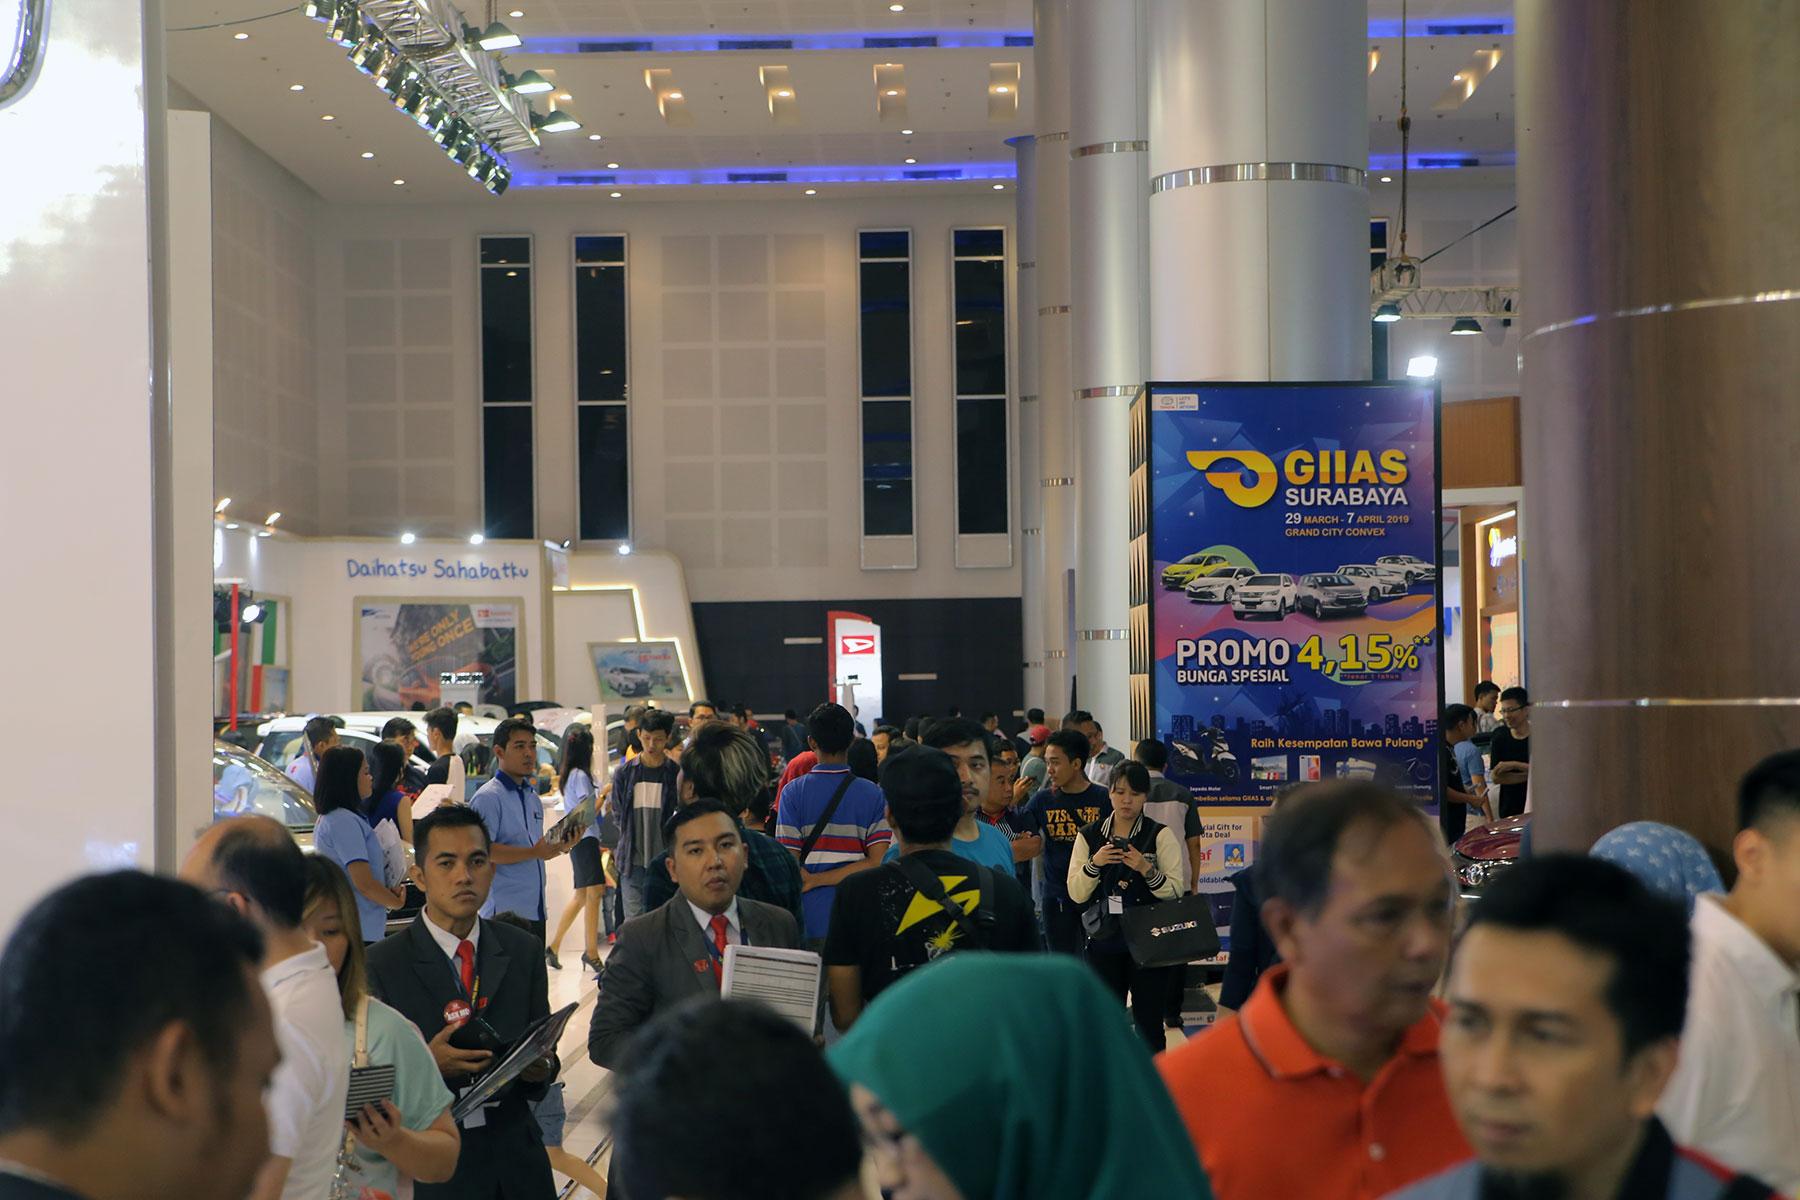 GIIAS Surabaya Sebentar Lagi, Catat Harga Tiketnya